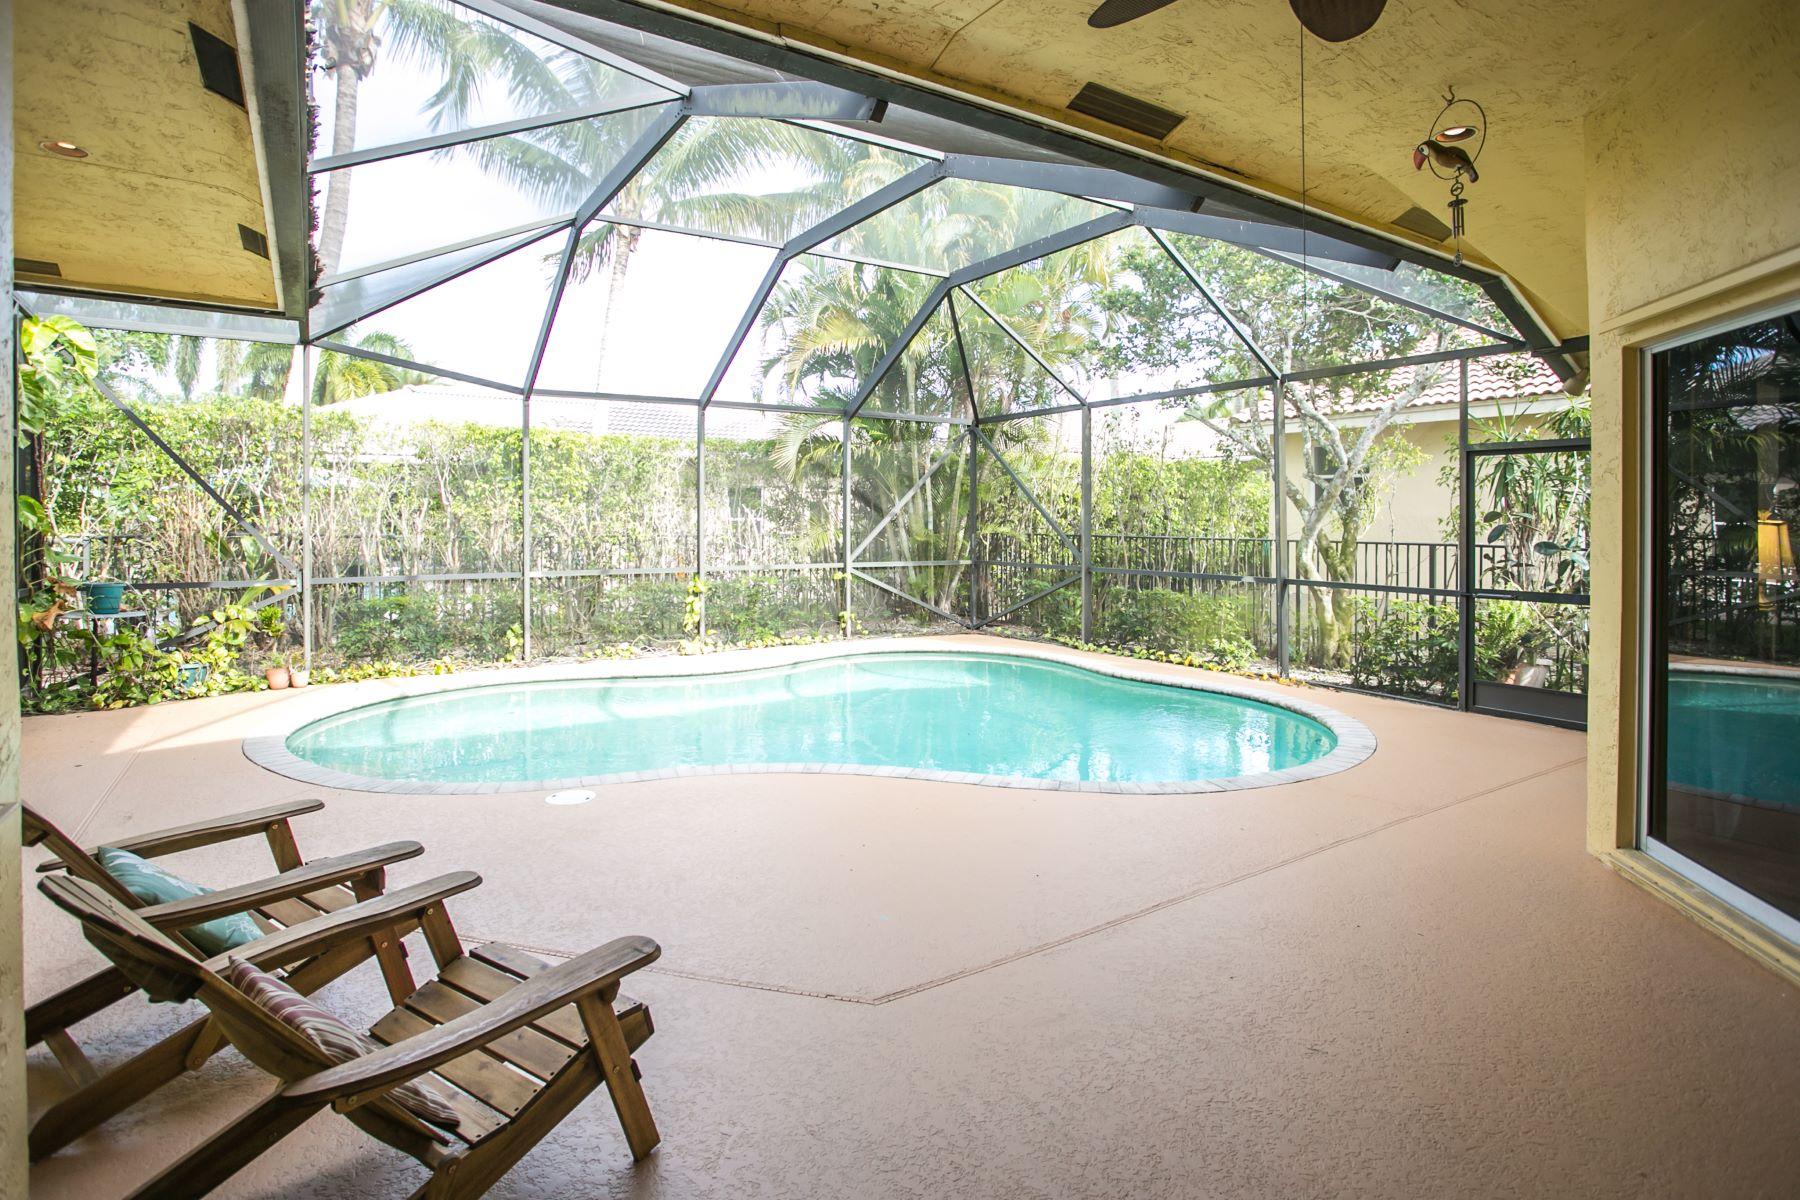 Single Family Homes for Active at 3764 Oak Ridge Cir Weston, Florida 33331 United States